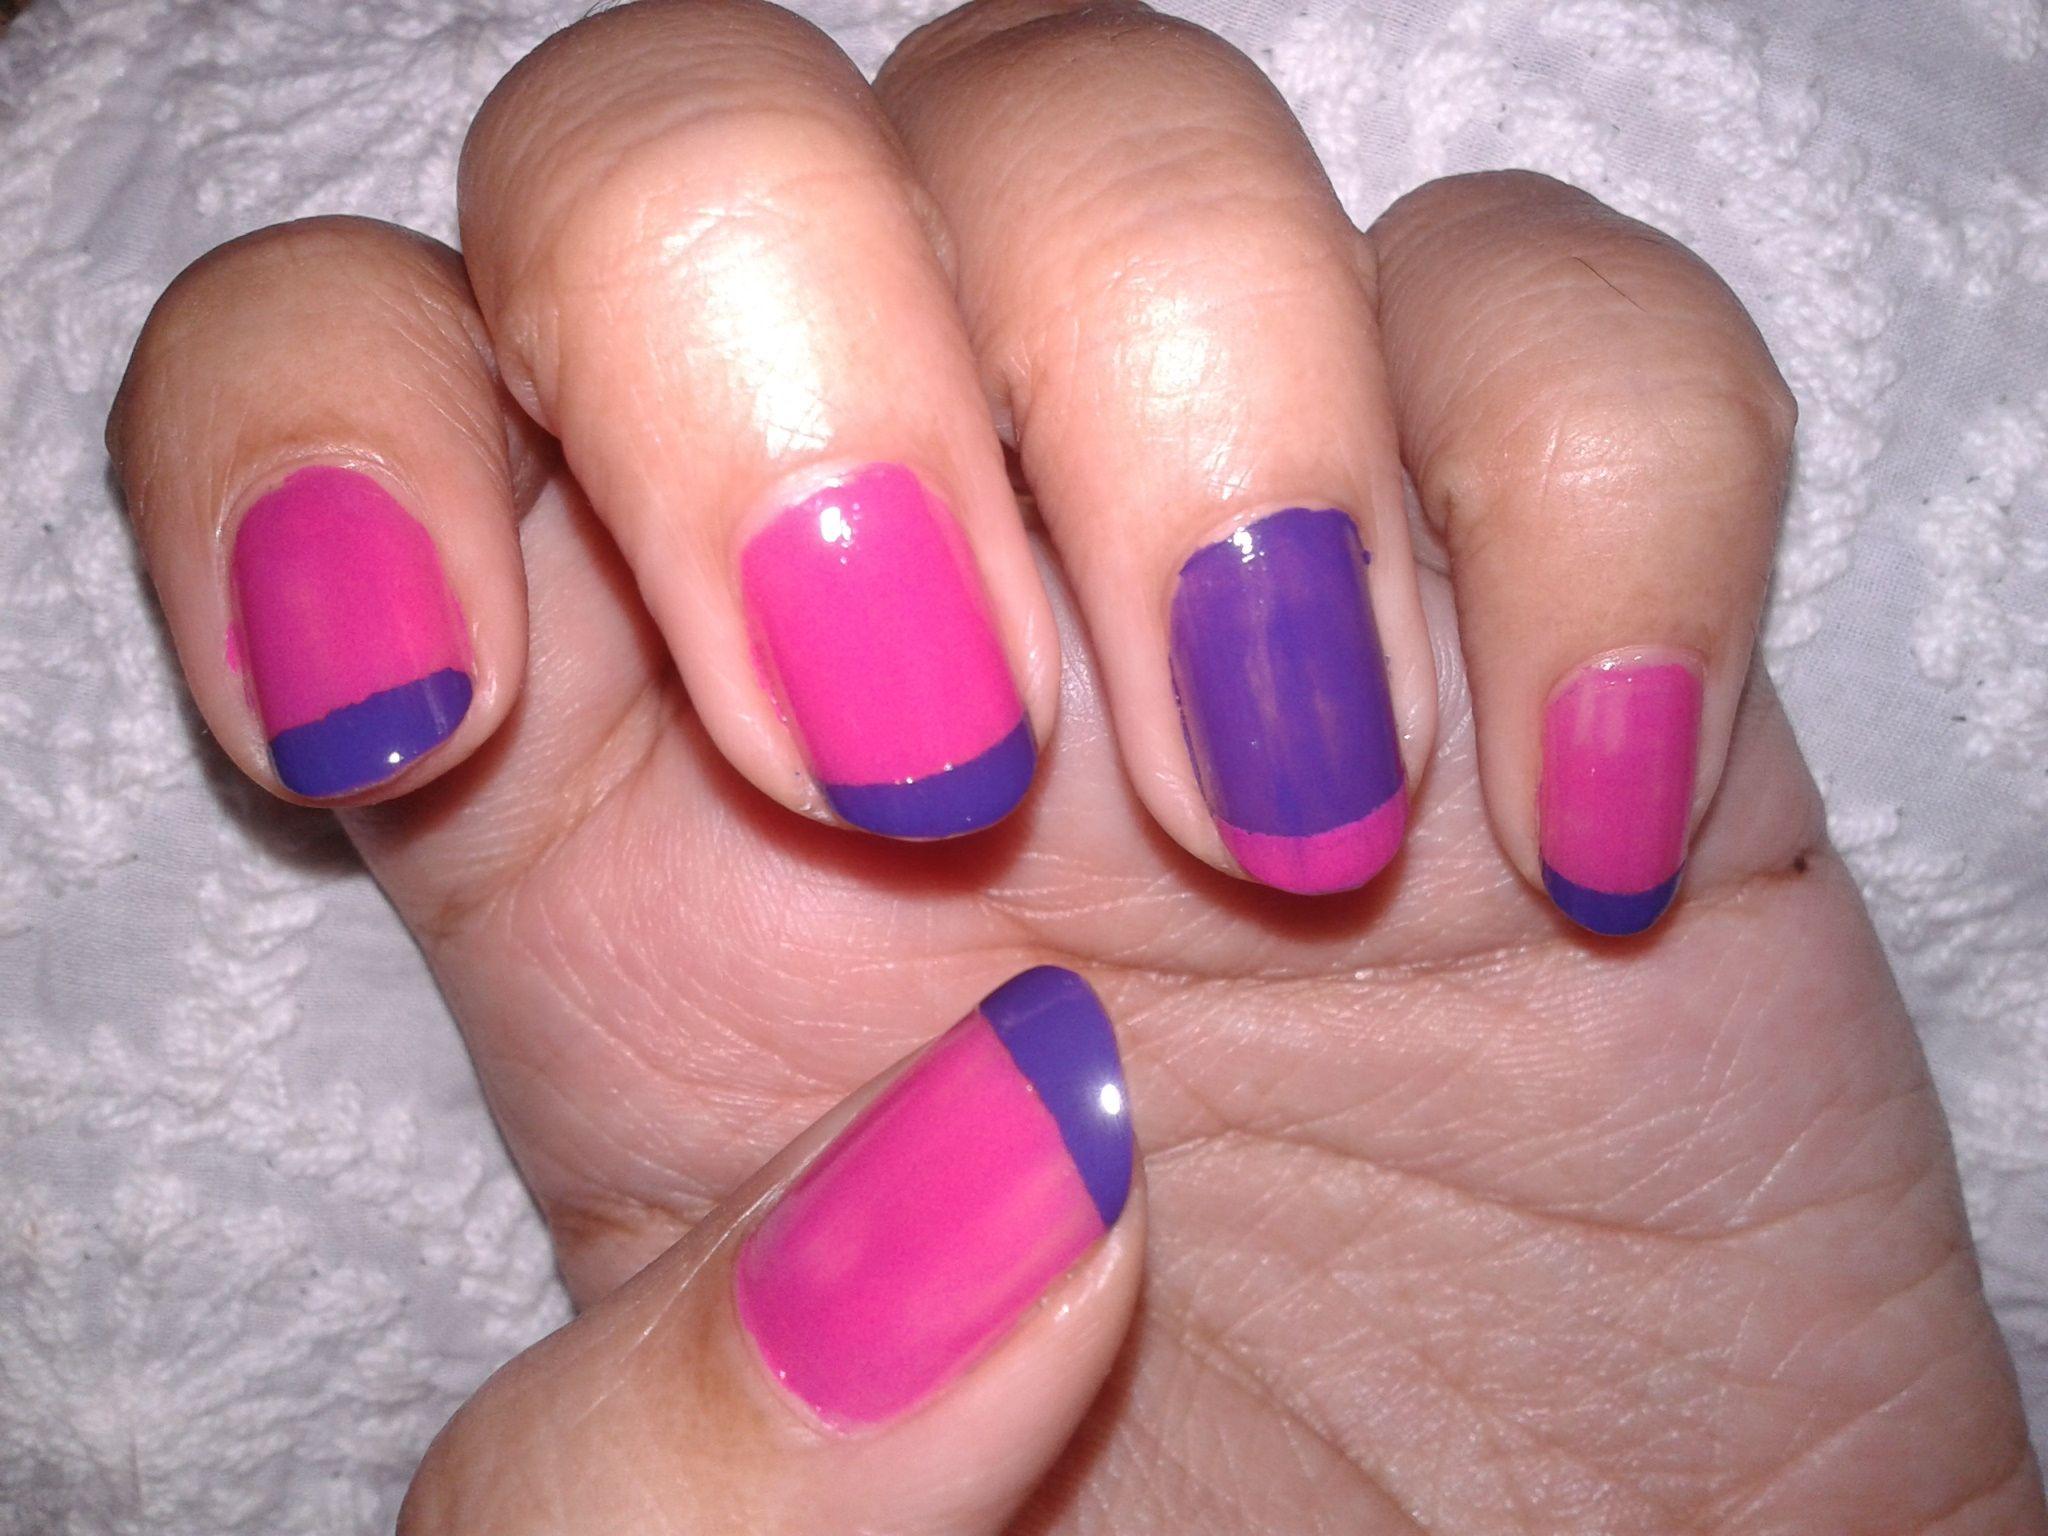 Pink and purple nail art   My Nail Arts   Pinterest   Purple nail ...